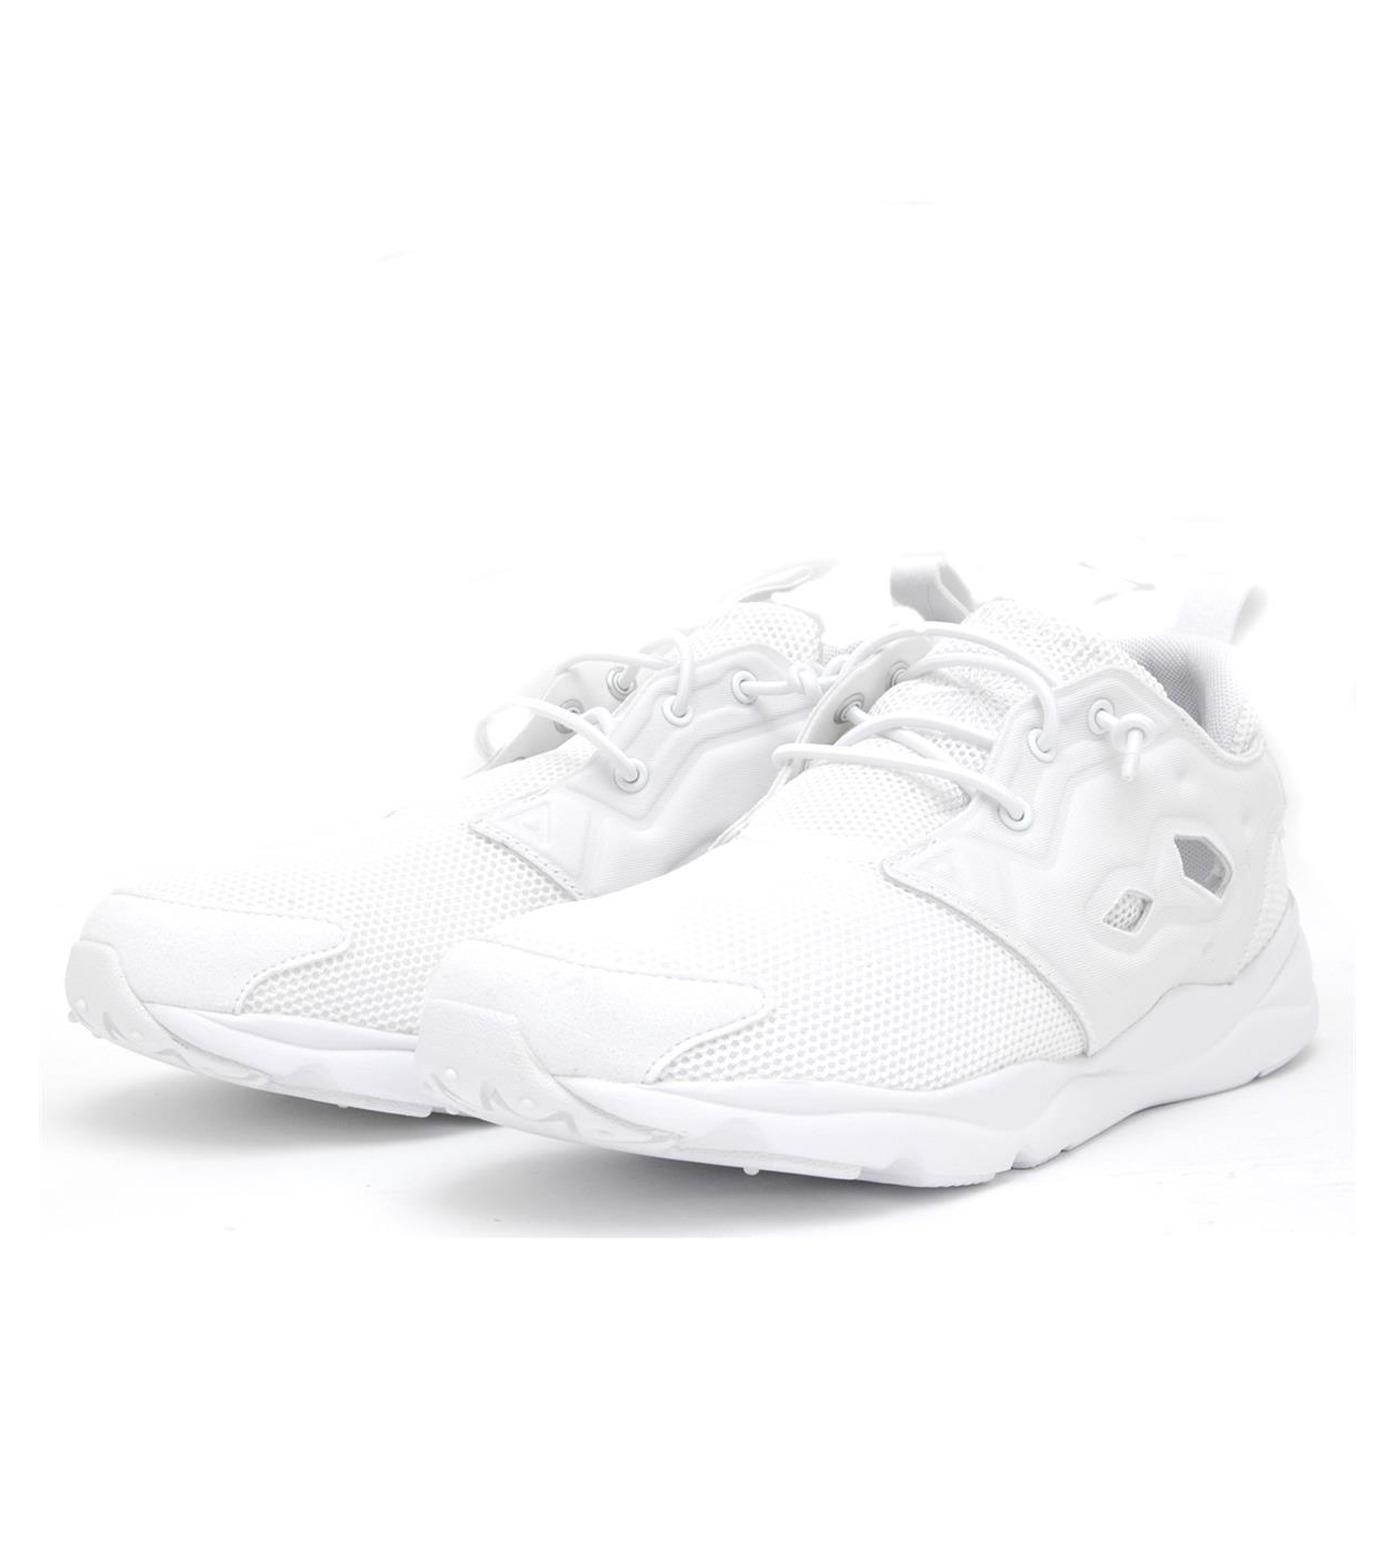 Reebok(リーボック)のFURYLITE-WHITE(シューズ/shoes)-V67158-4 拡大詳細画像3